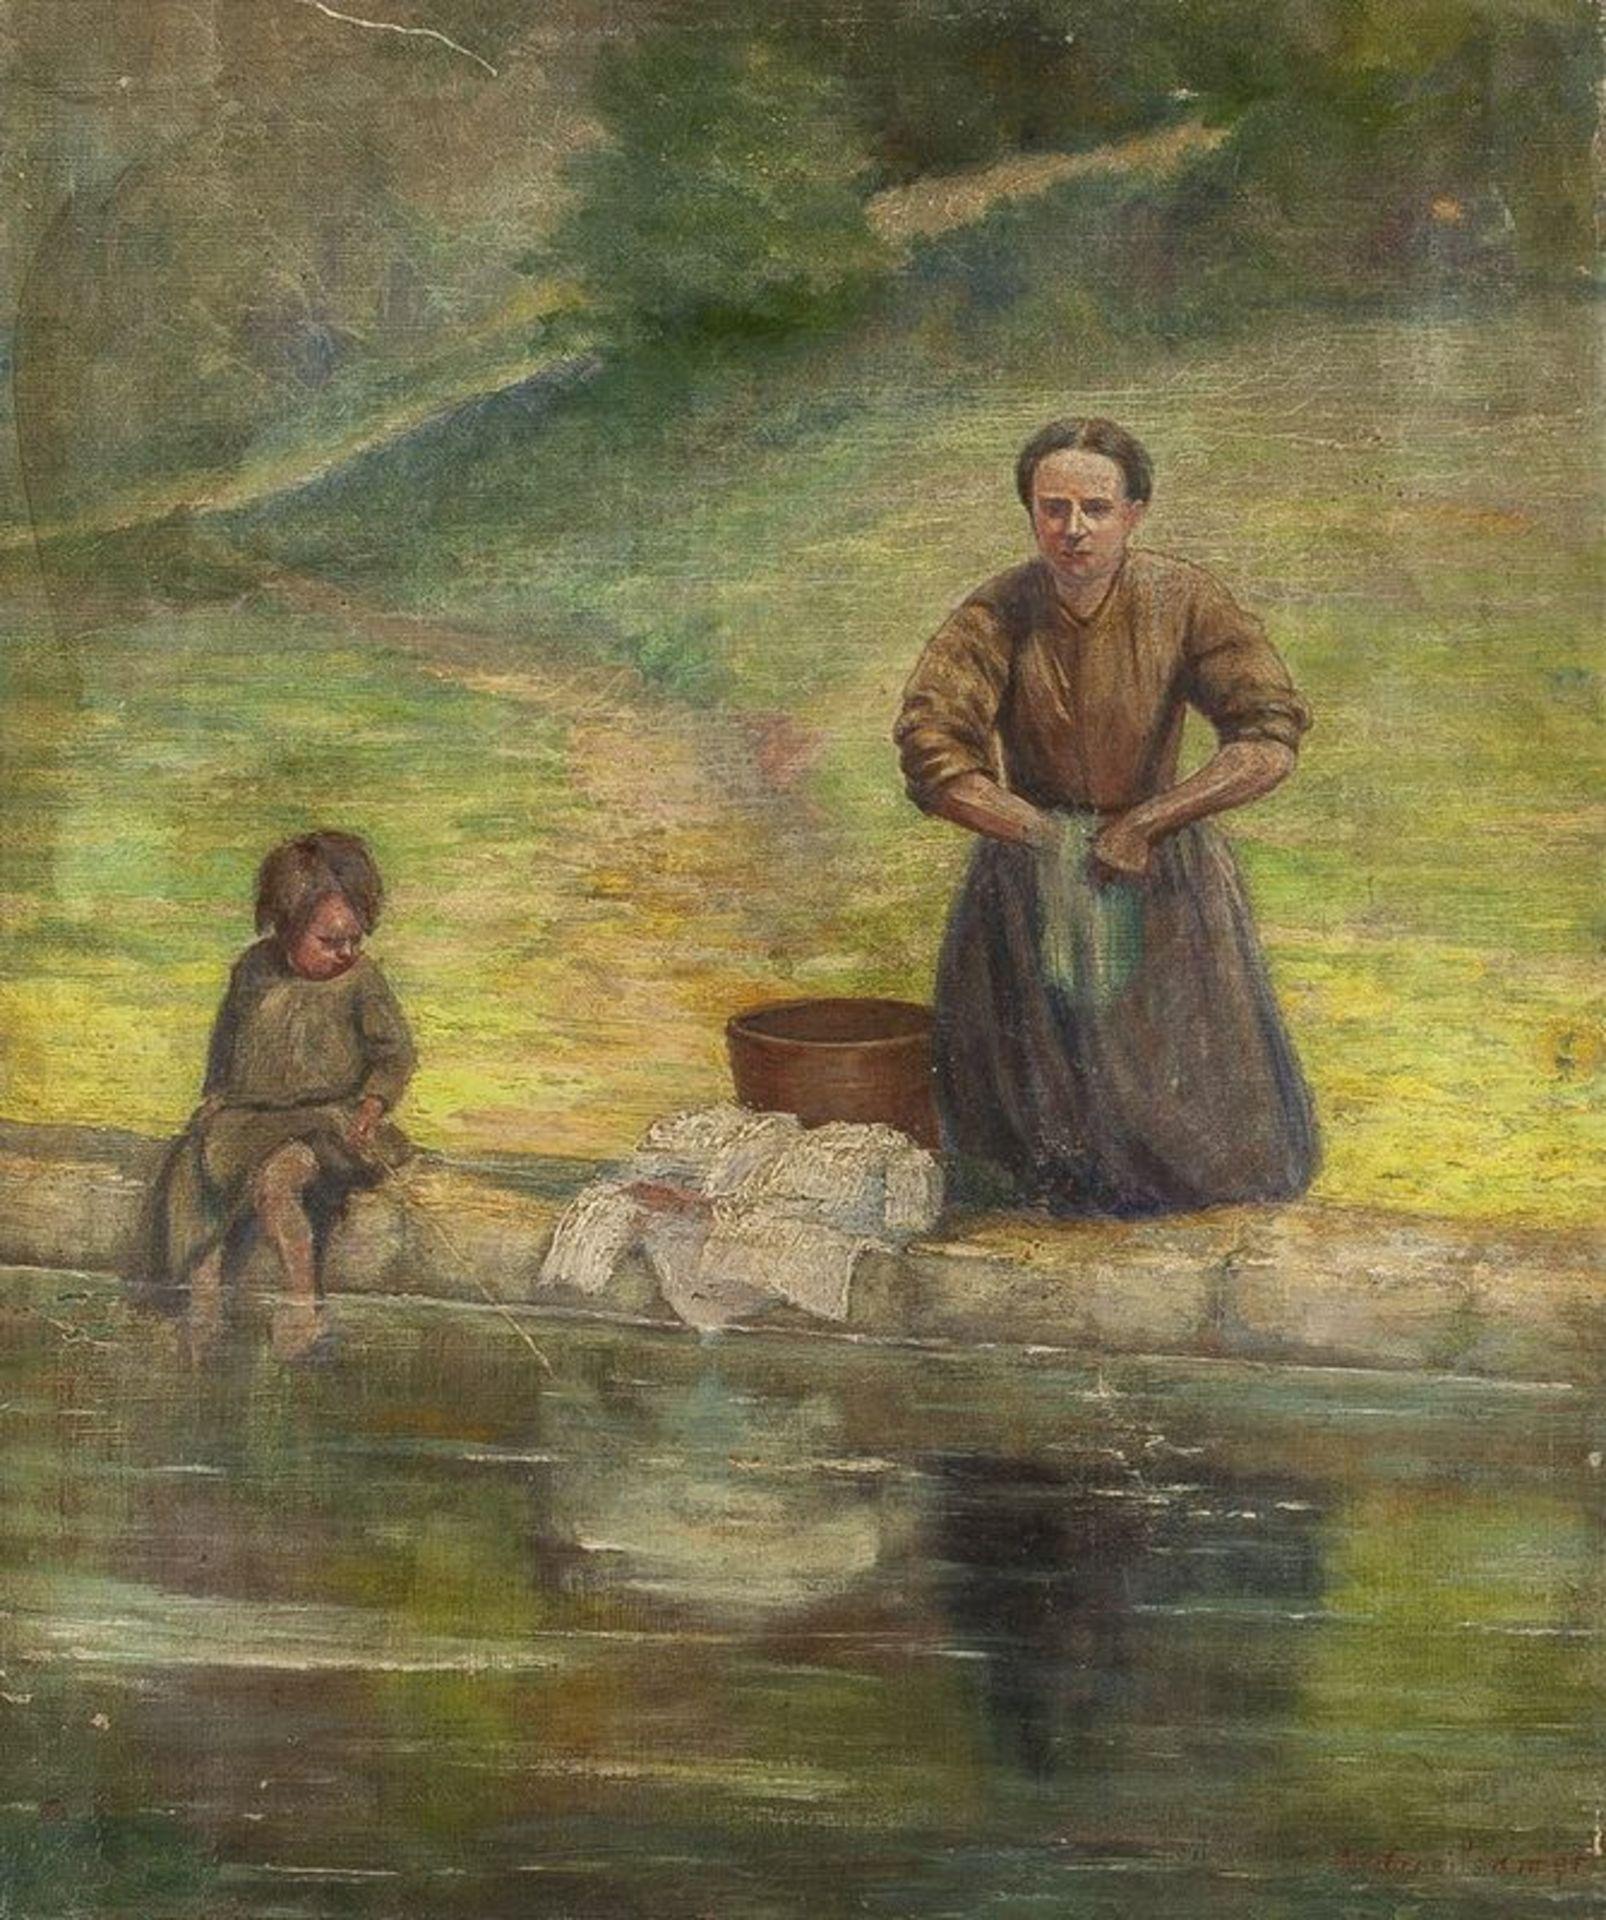 Los 605 - ALPHONSE GREISALMER (XIX-XX) Laundry on the riverside - Signed. 'A. Greisalmer' [...]